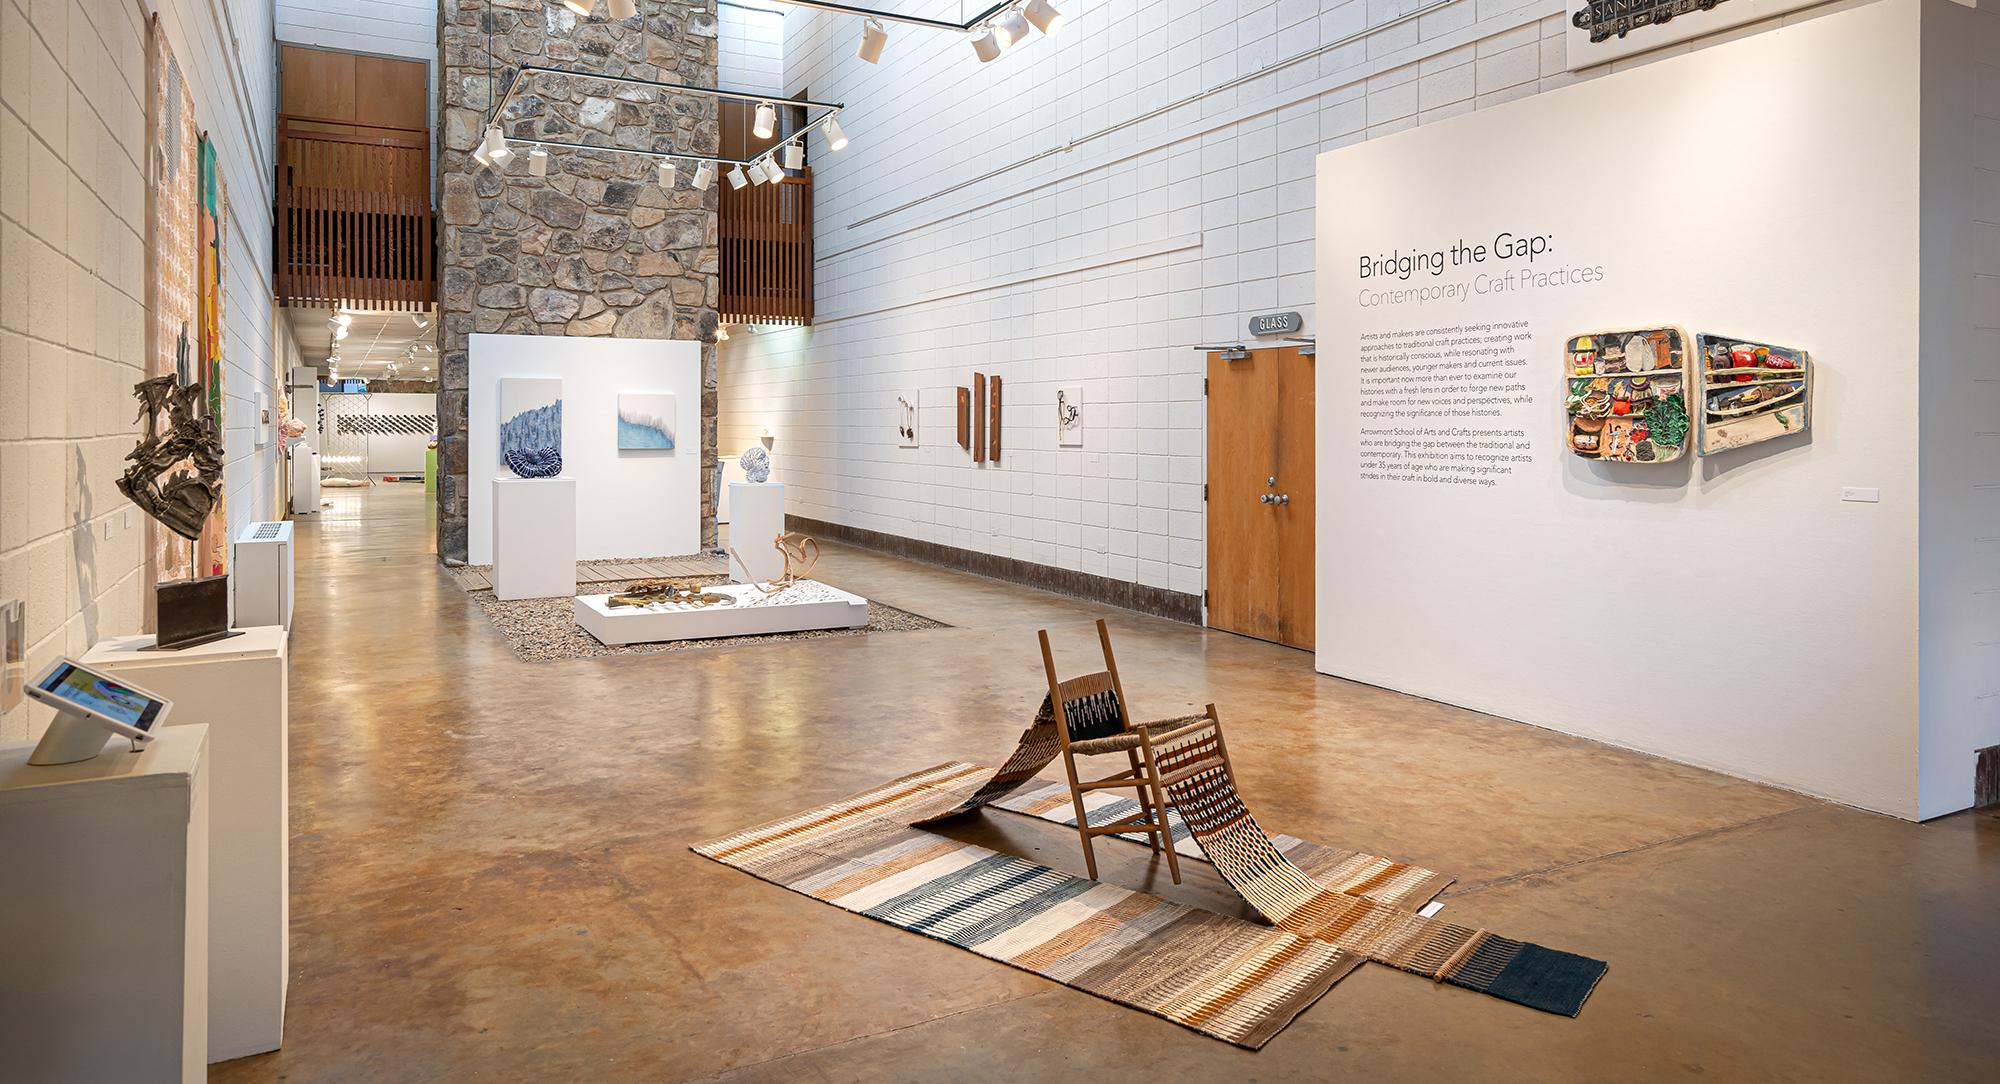 Bridging the Gap: Contemporary Craft Practices  installation view at Arrowmont's Sandra J. Blain Gallery. Photo by Robert Batey.